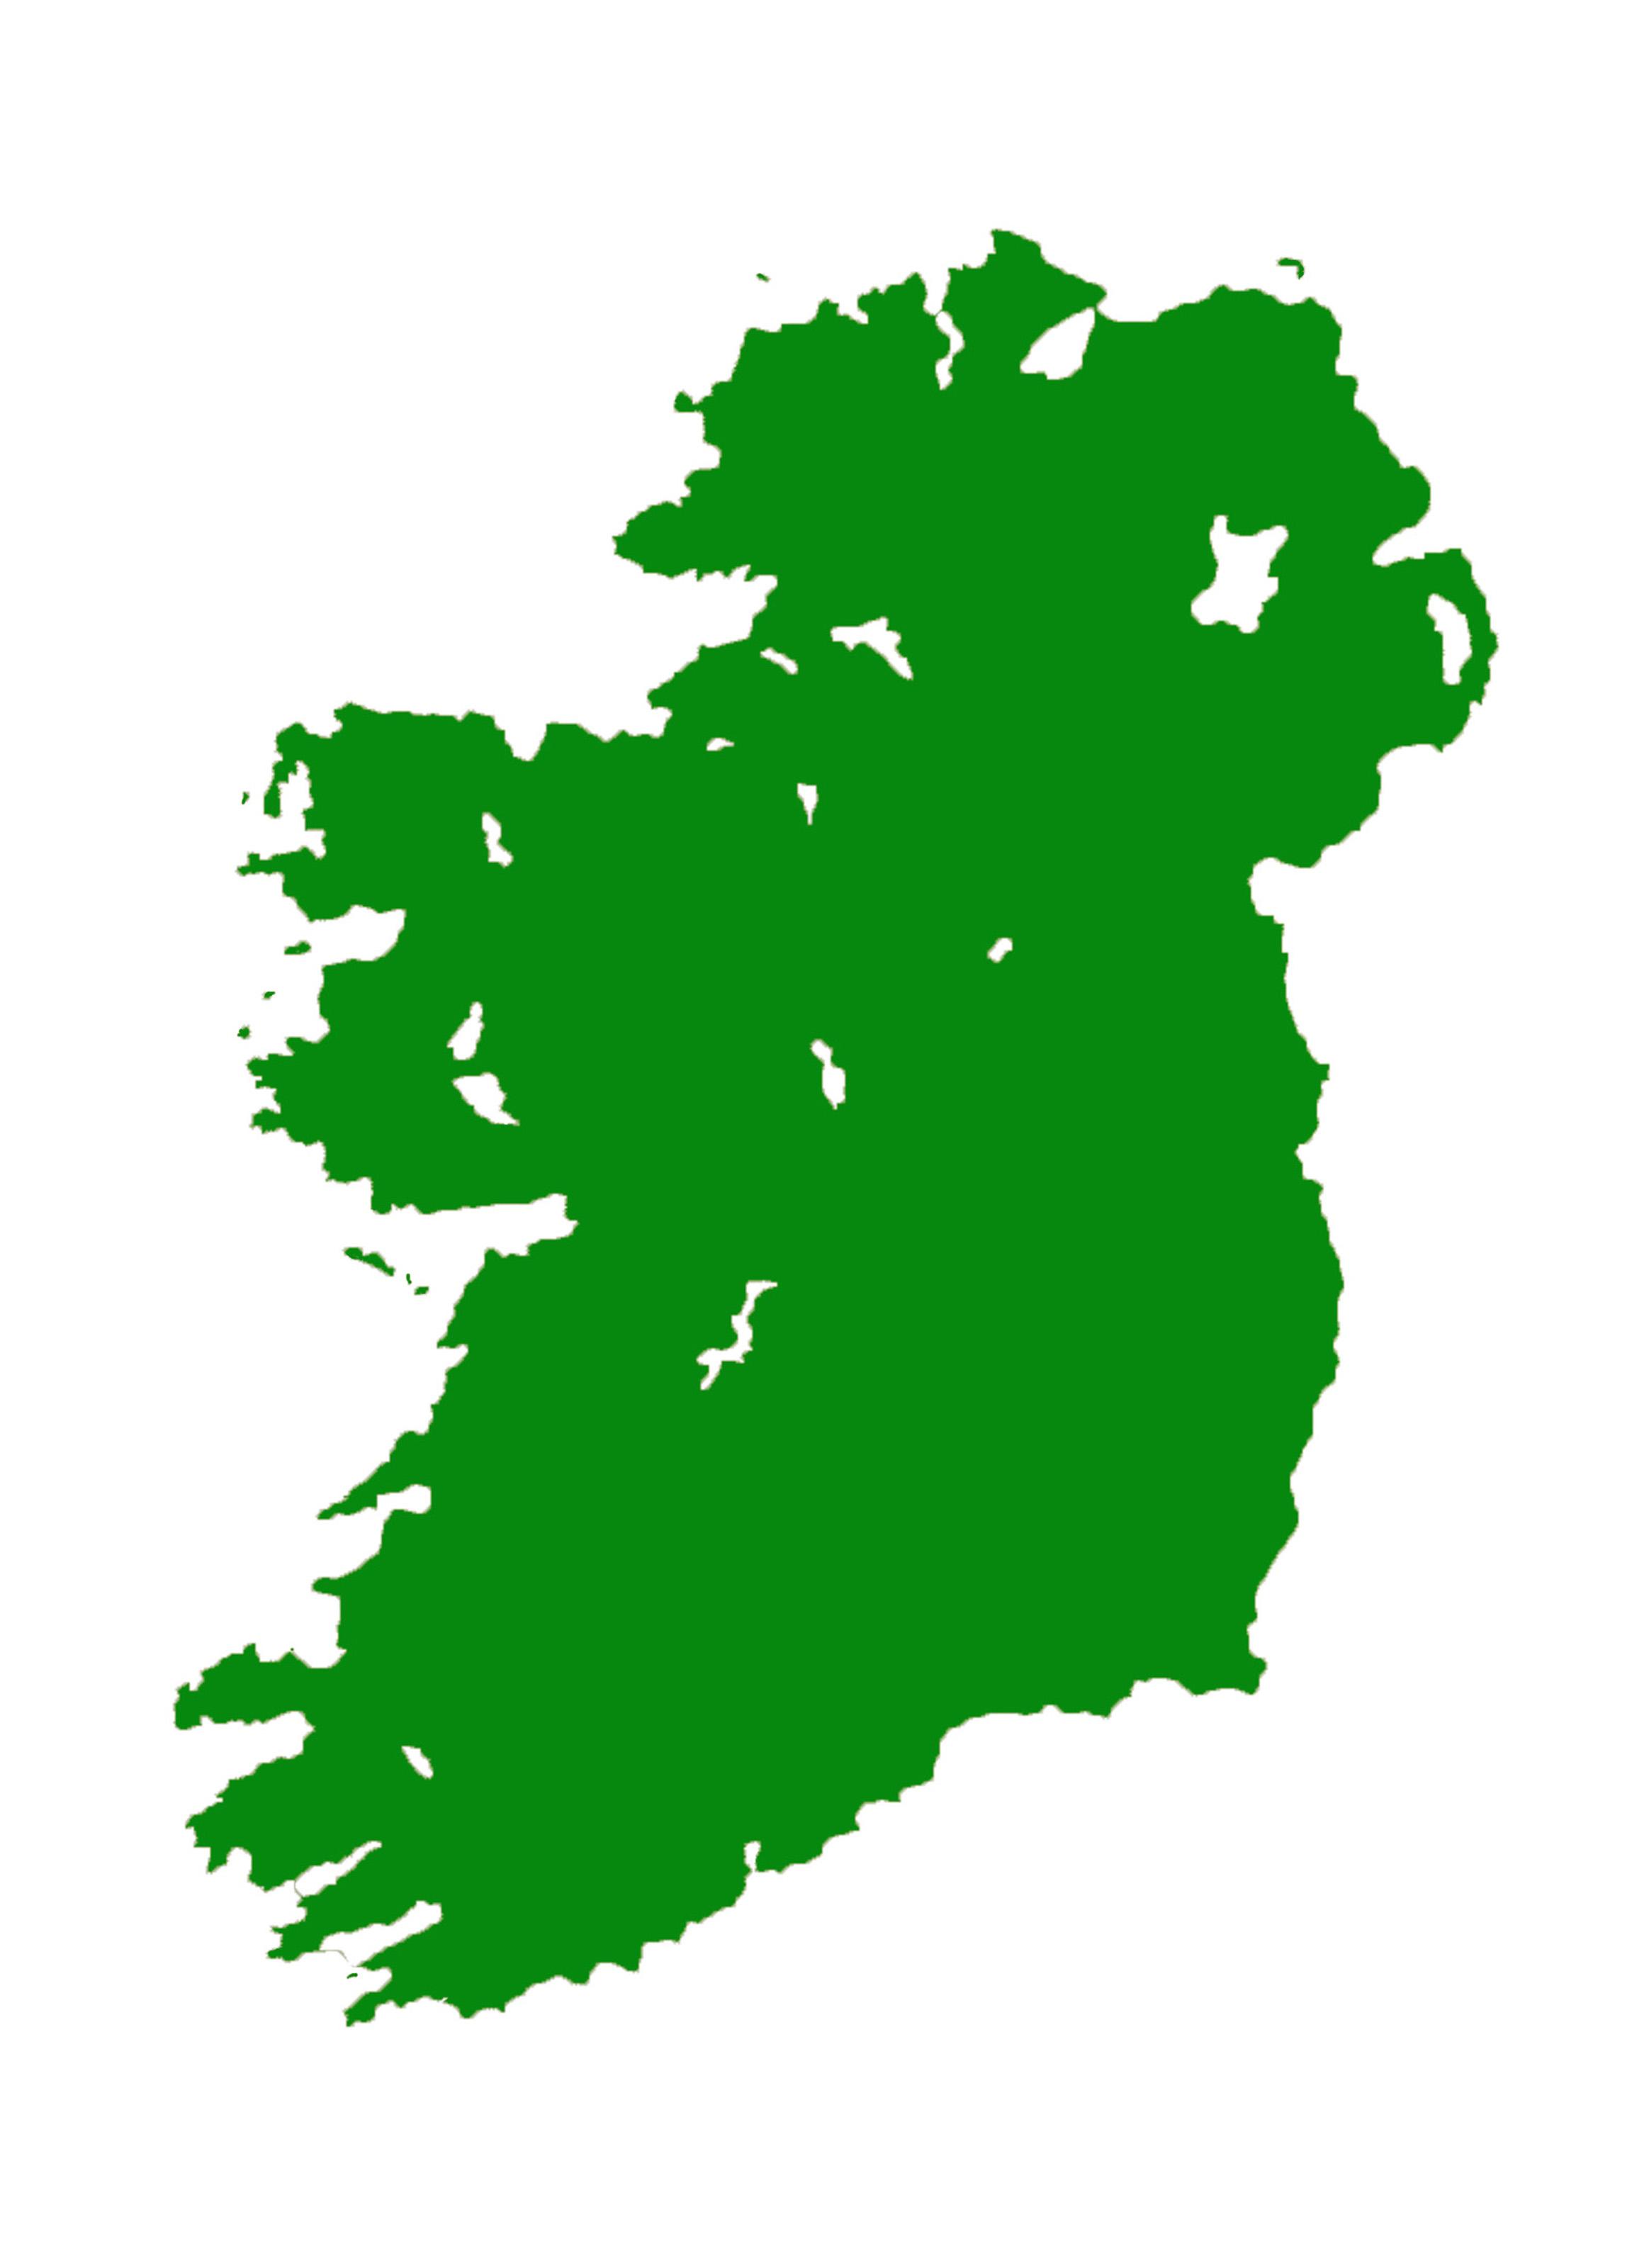 cliparts irland - photo #15